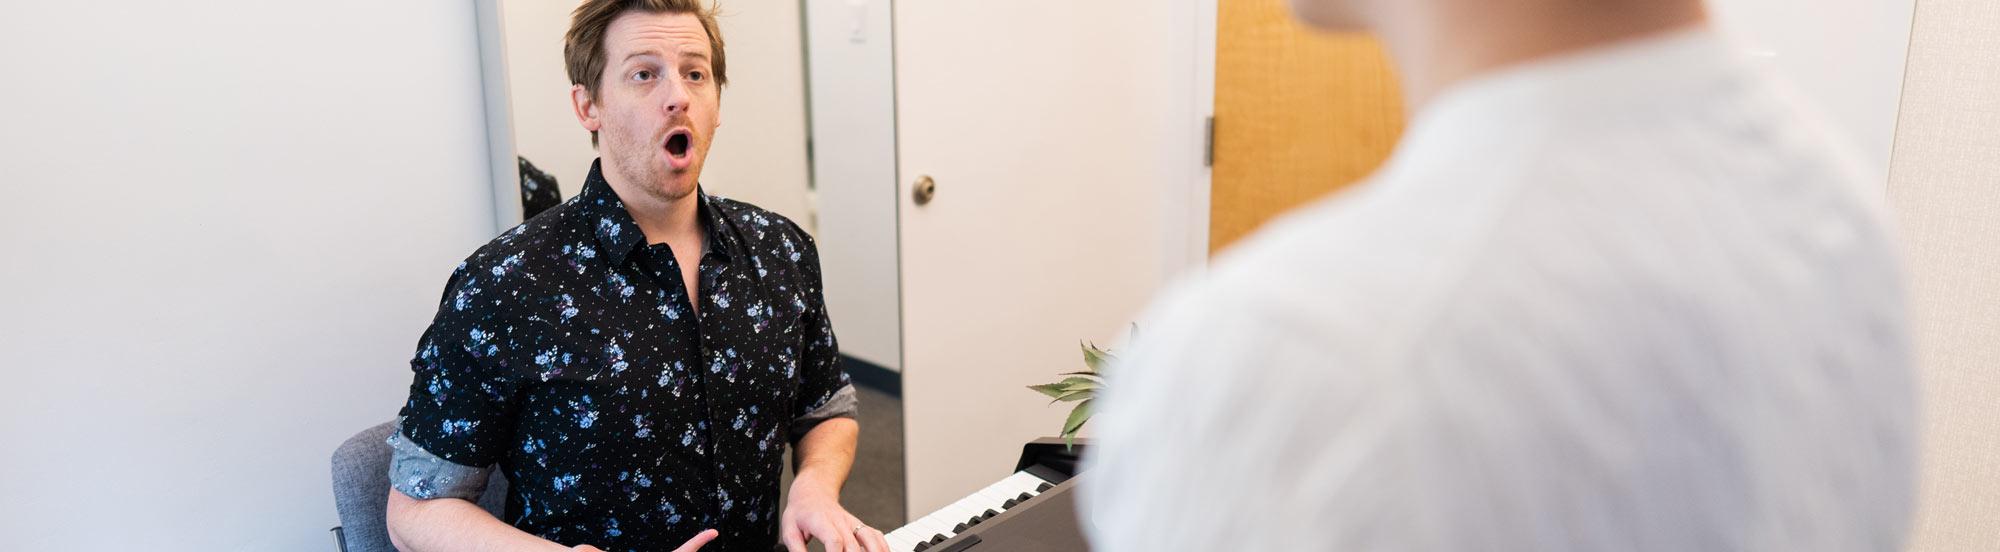 Vocal Coaching hero